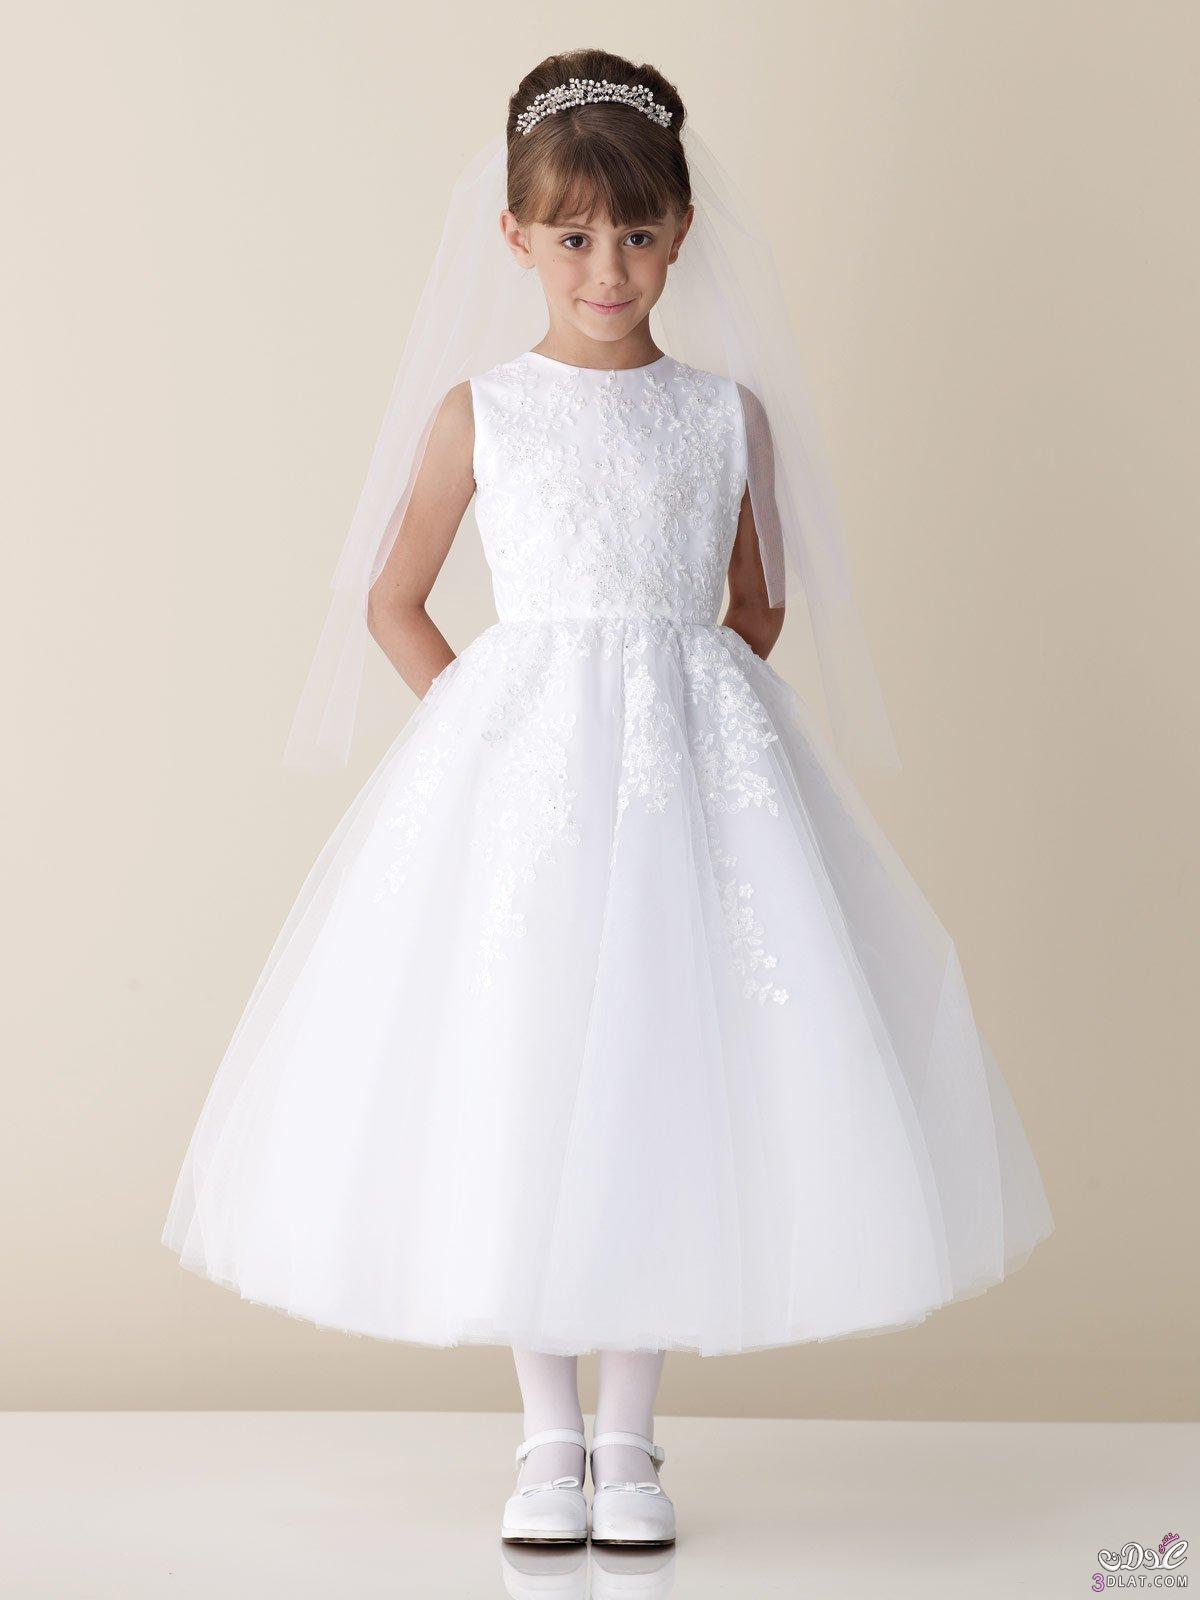 ea81fe6884676 ... فساتين اطفال بنات صغار ، كولكشن صور فساتين وملابس